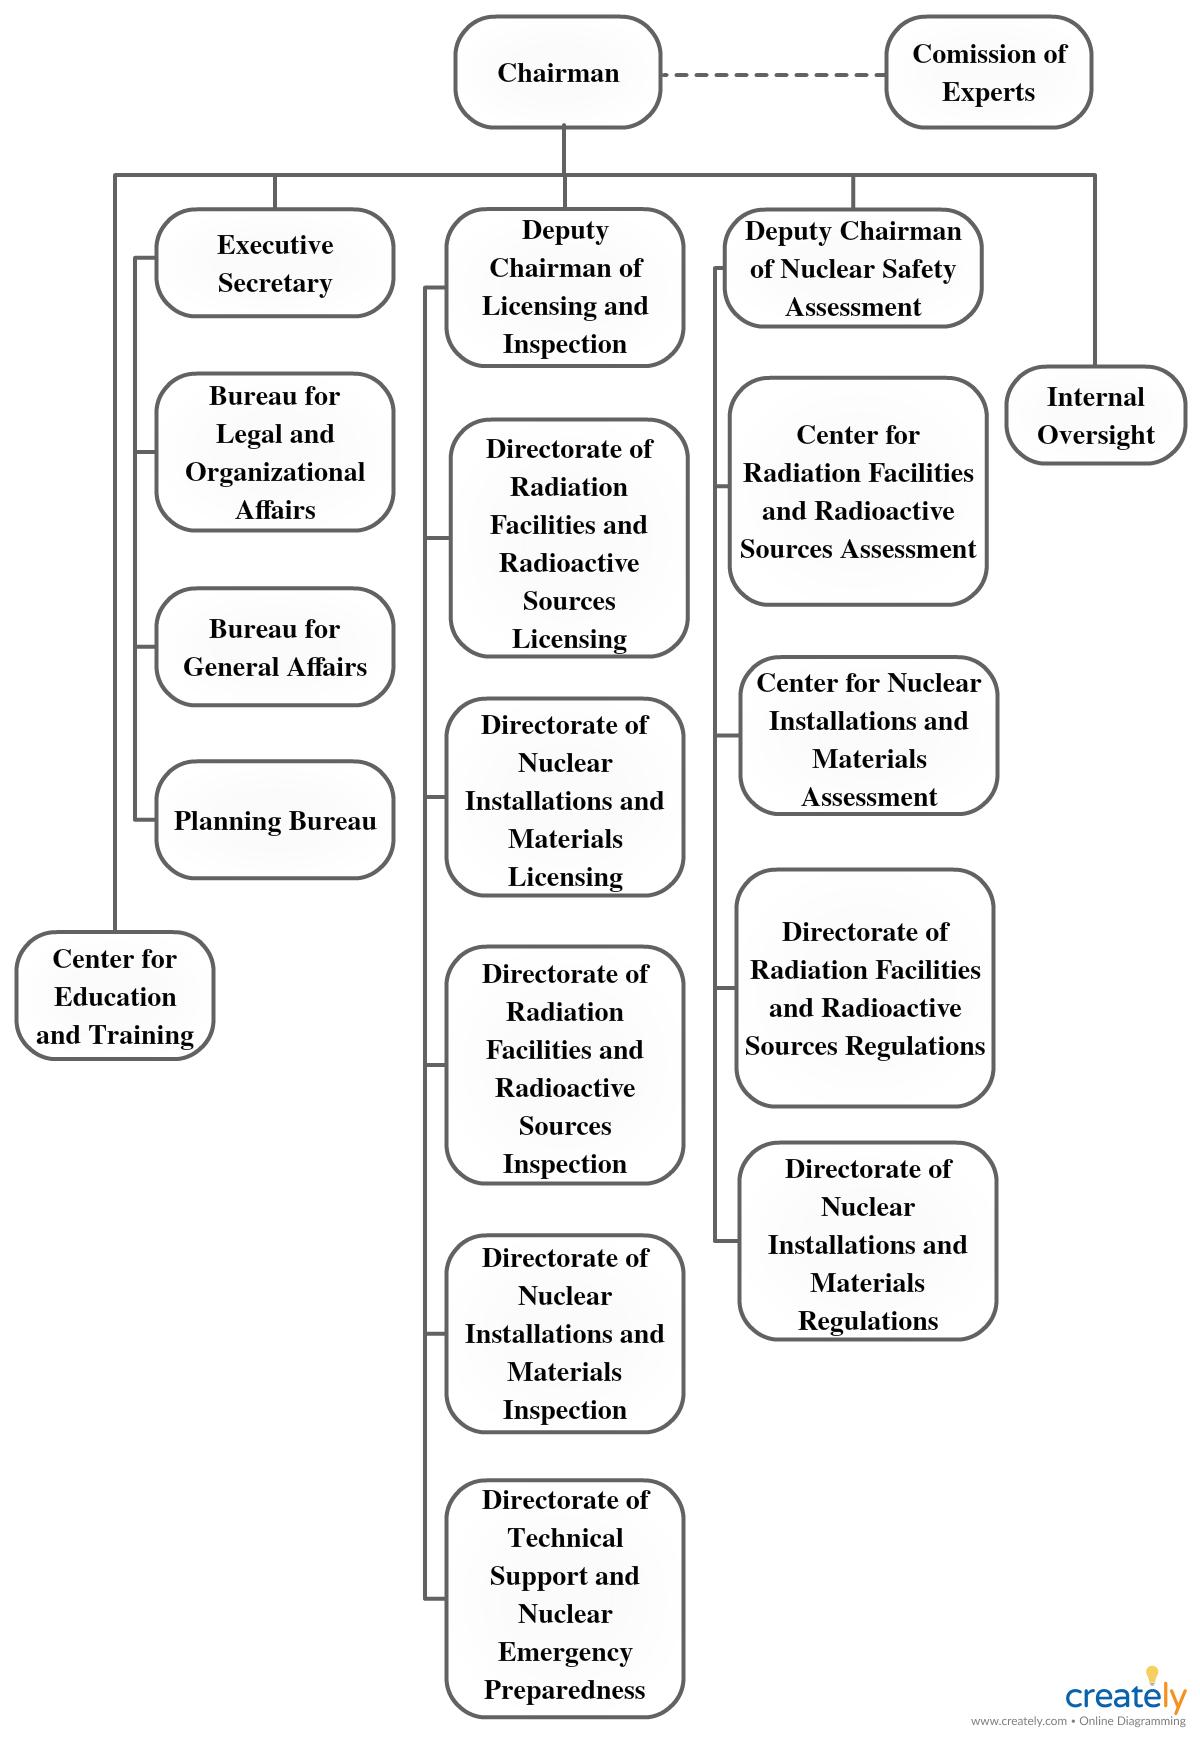 Download Template Struktur Organisasi Word : download, template, struktur, organisasi, Struktur, Organisasi, Organizational, Chart, Design,, Organization, Chart,